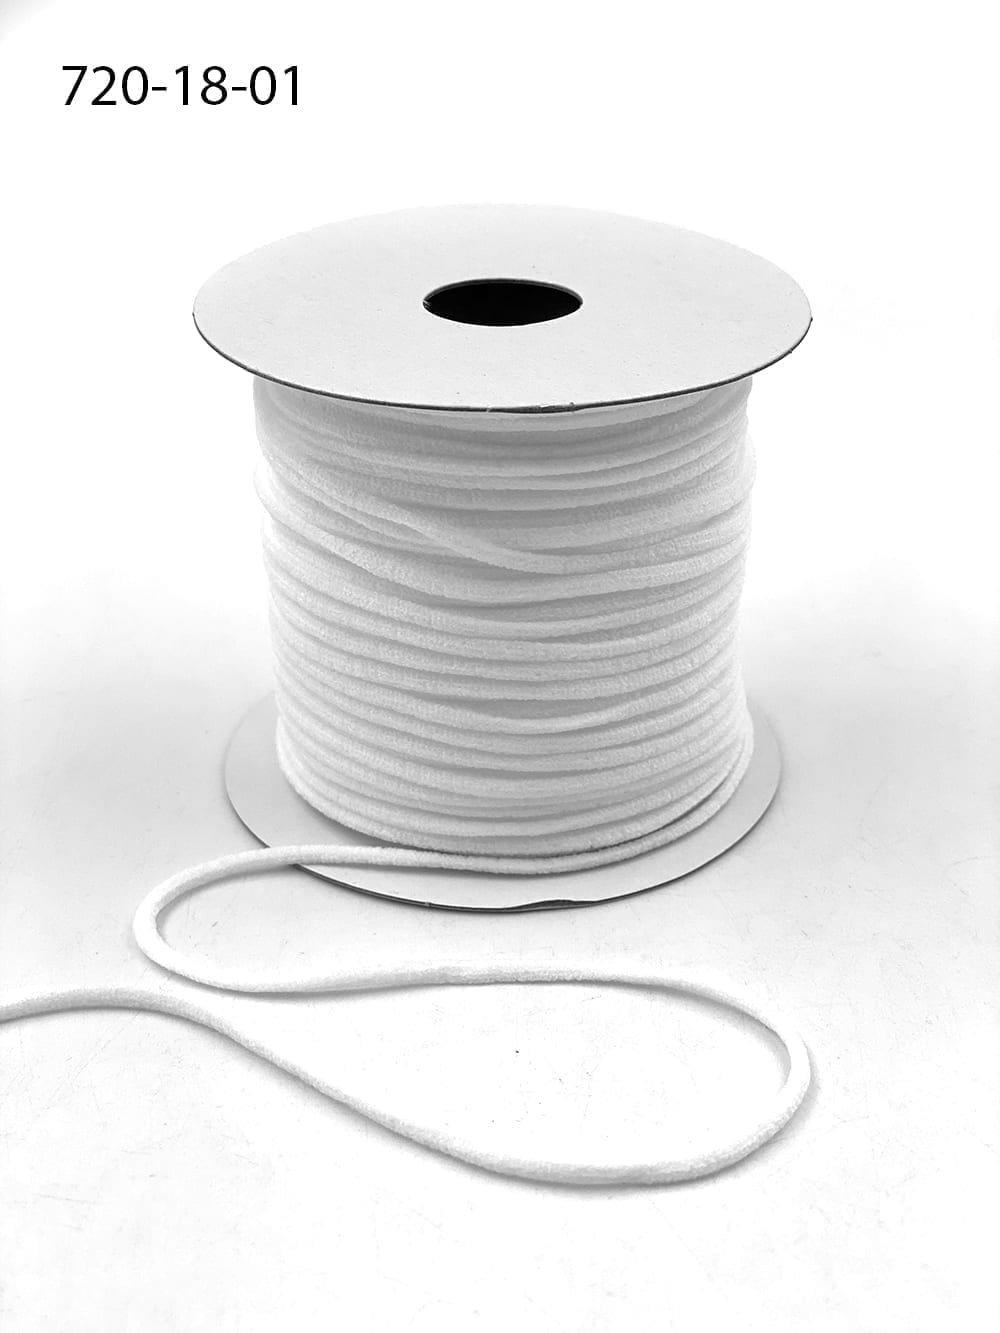 1/8  Nylon Round Elastic Cord - White - 50yd Spool